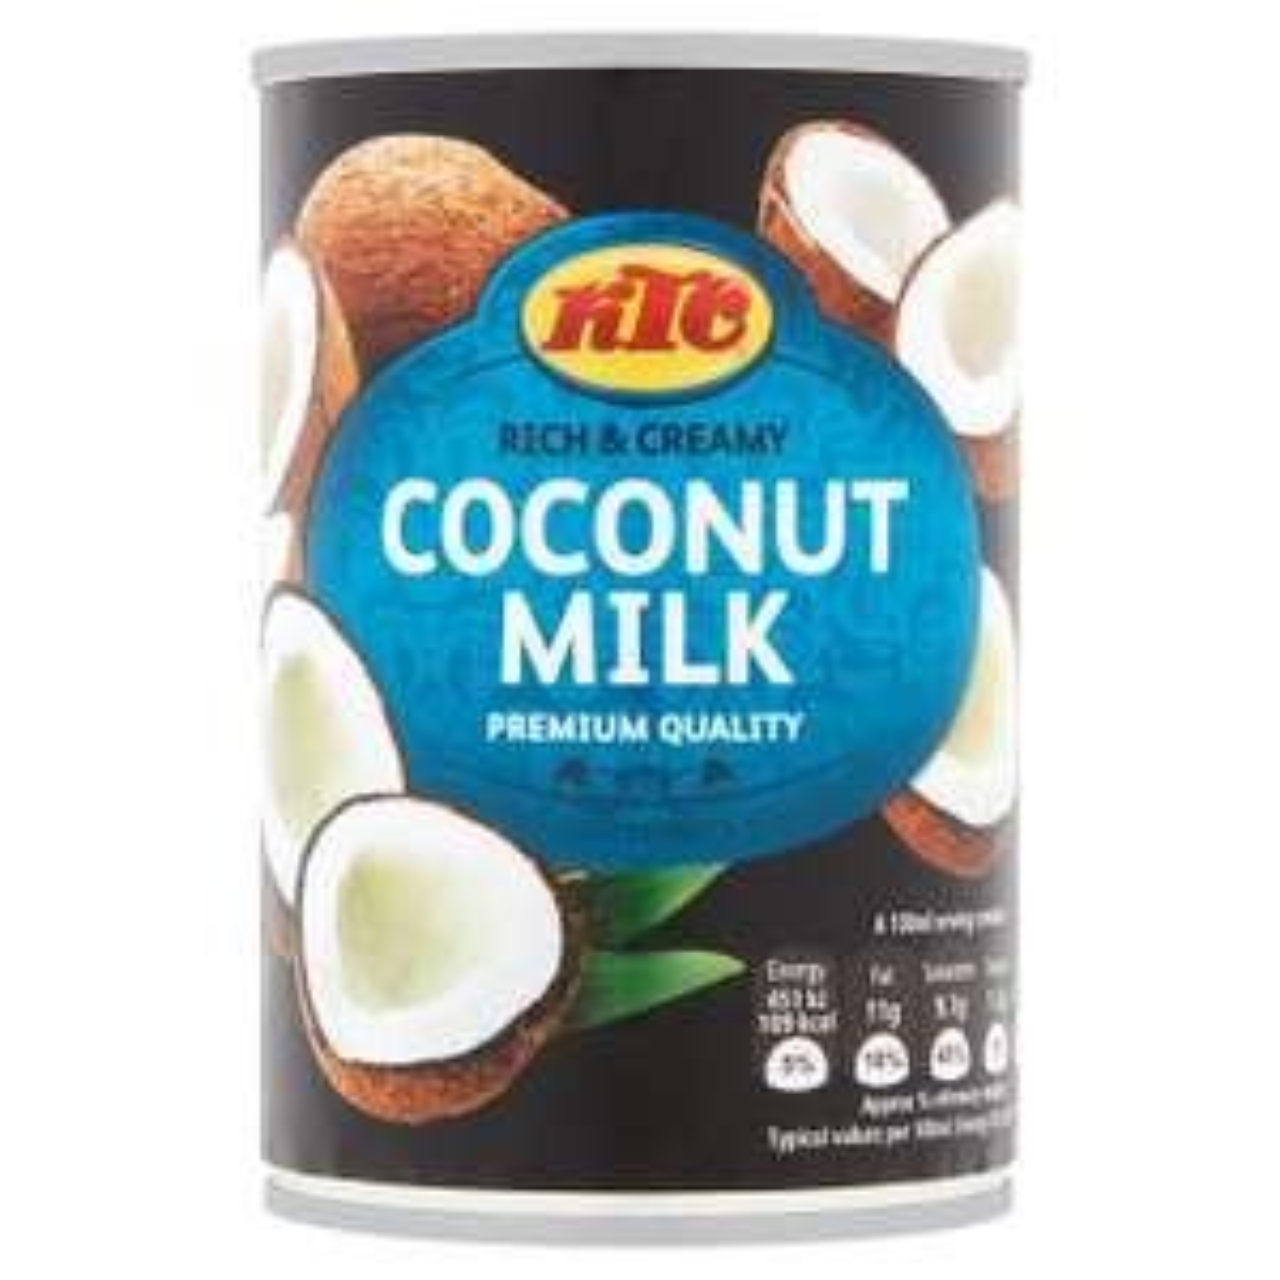 KTC Coconut Milk 400g for 50p (min basket + delivery charges apply) @ Morrisons